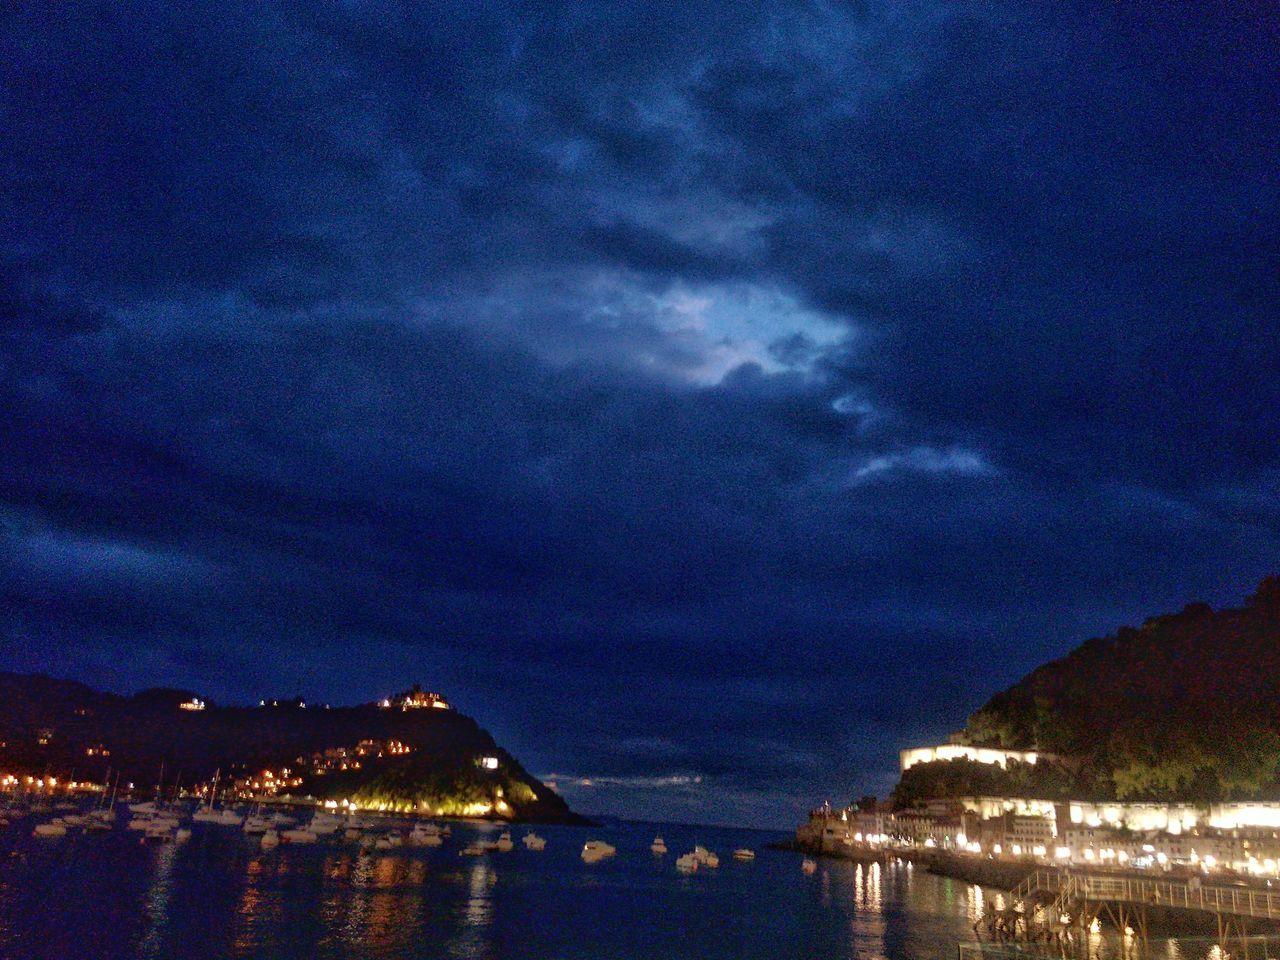 Taking Photos EyeEm Hi! Illuminated Darkness And Light Sea Ships Boats Nightphotography Nightlights City Lights He Visto La Luz I Wish You Were Here Dark Clouds